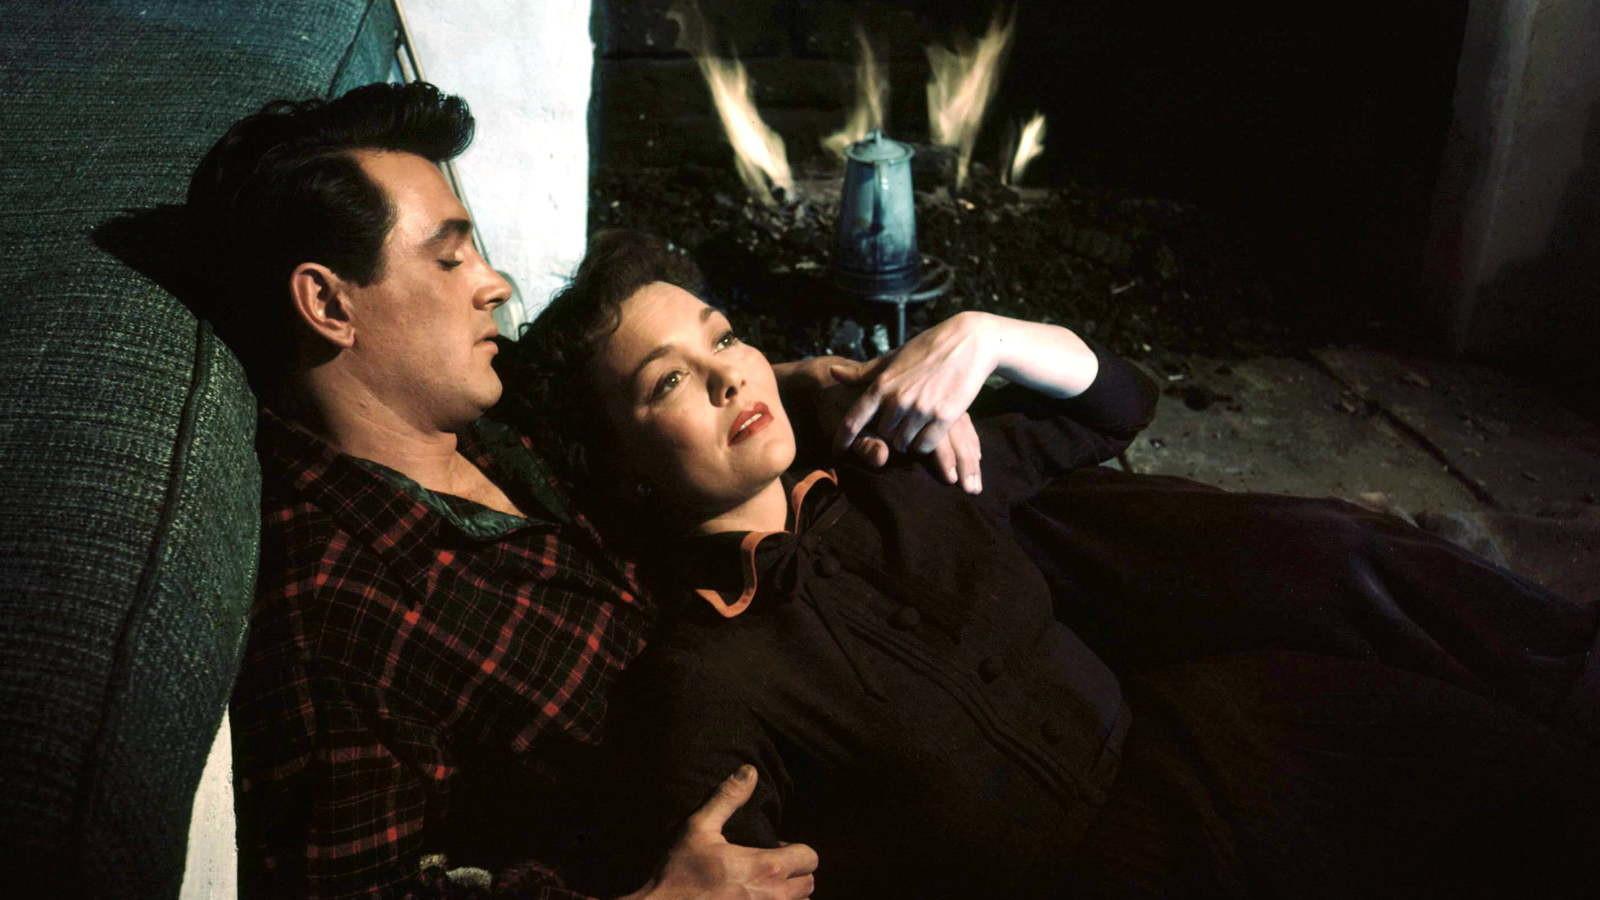 Jane Wyman All That Heaven Allows